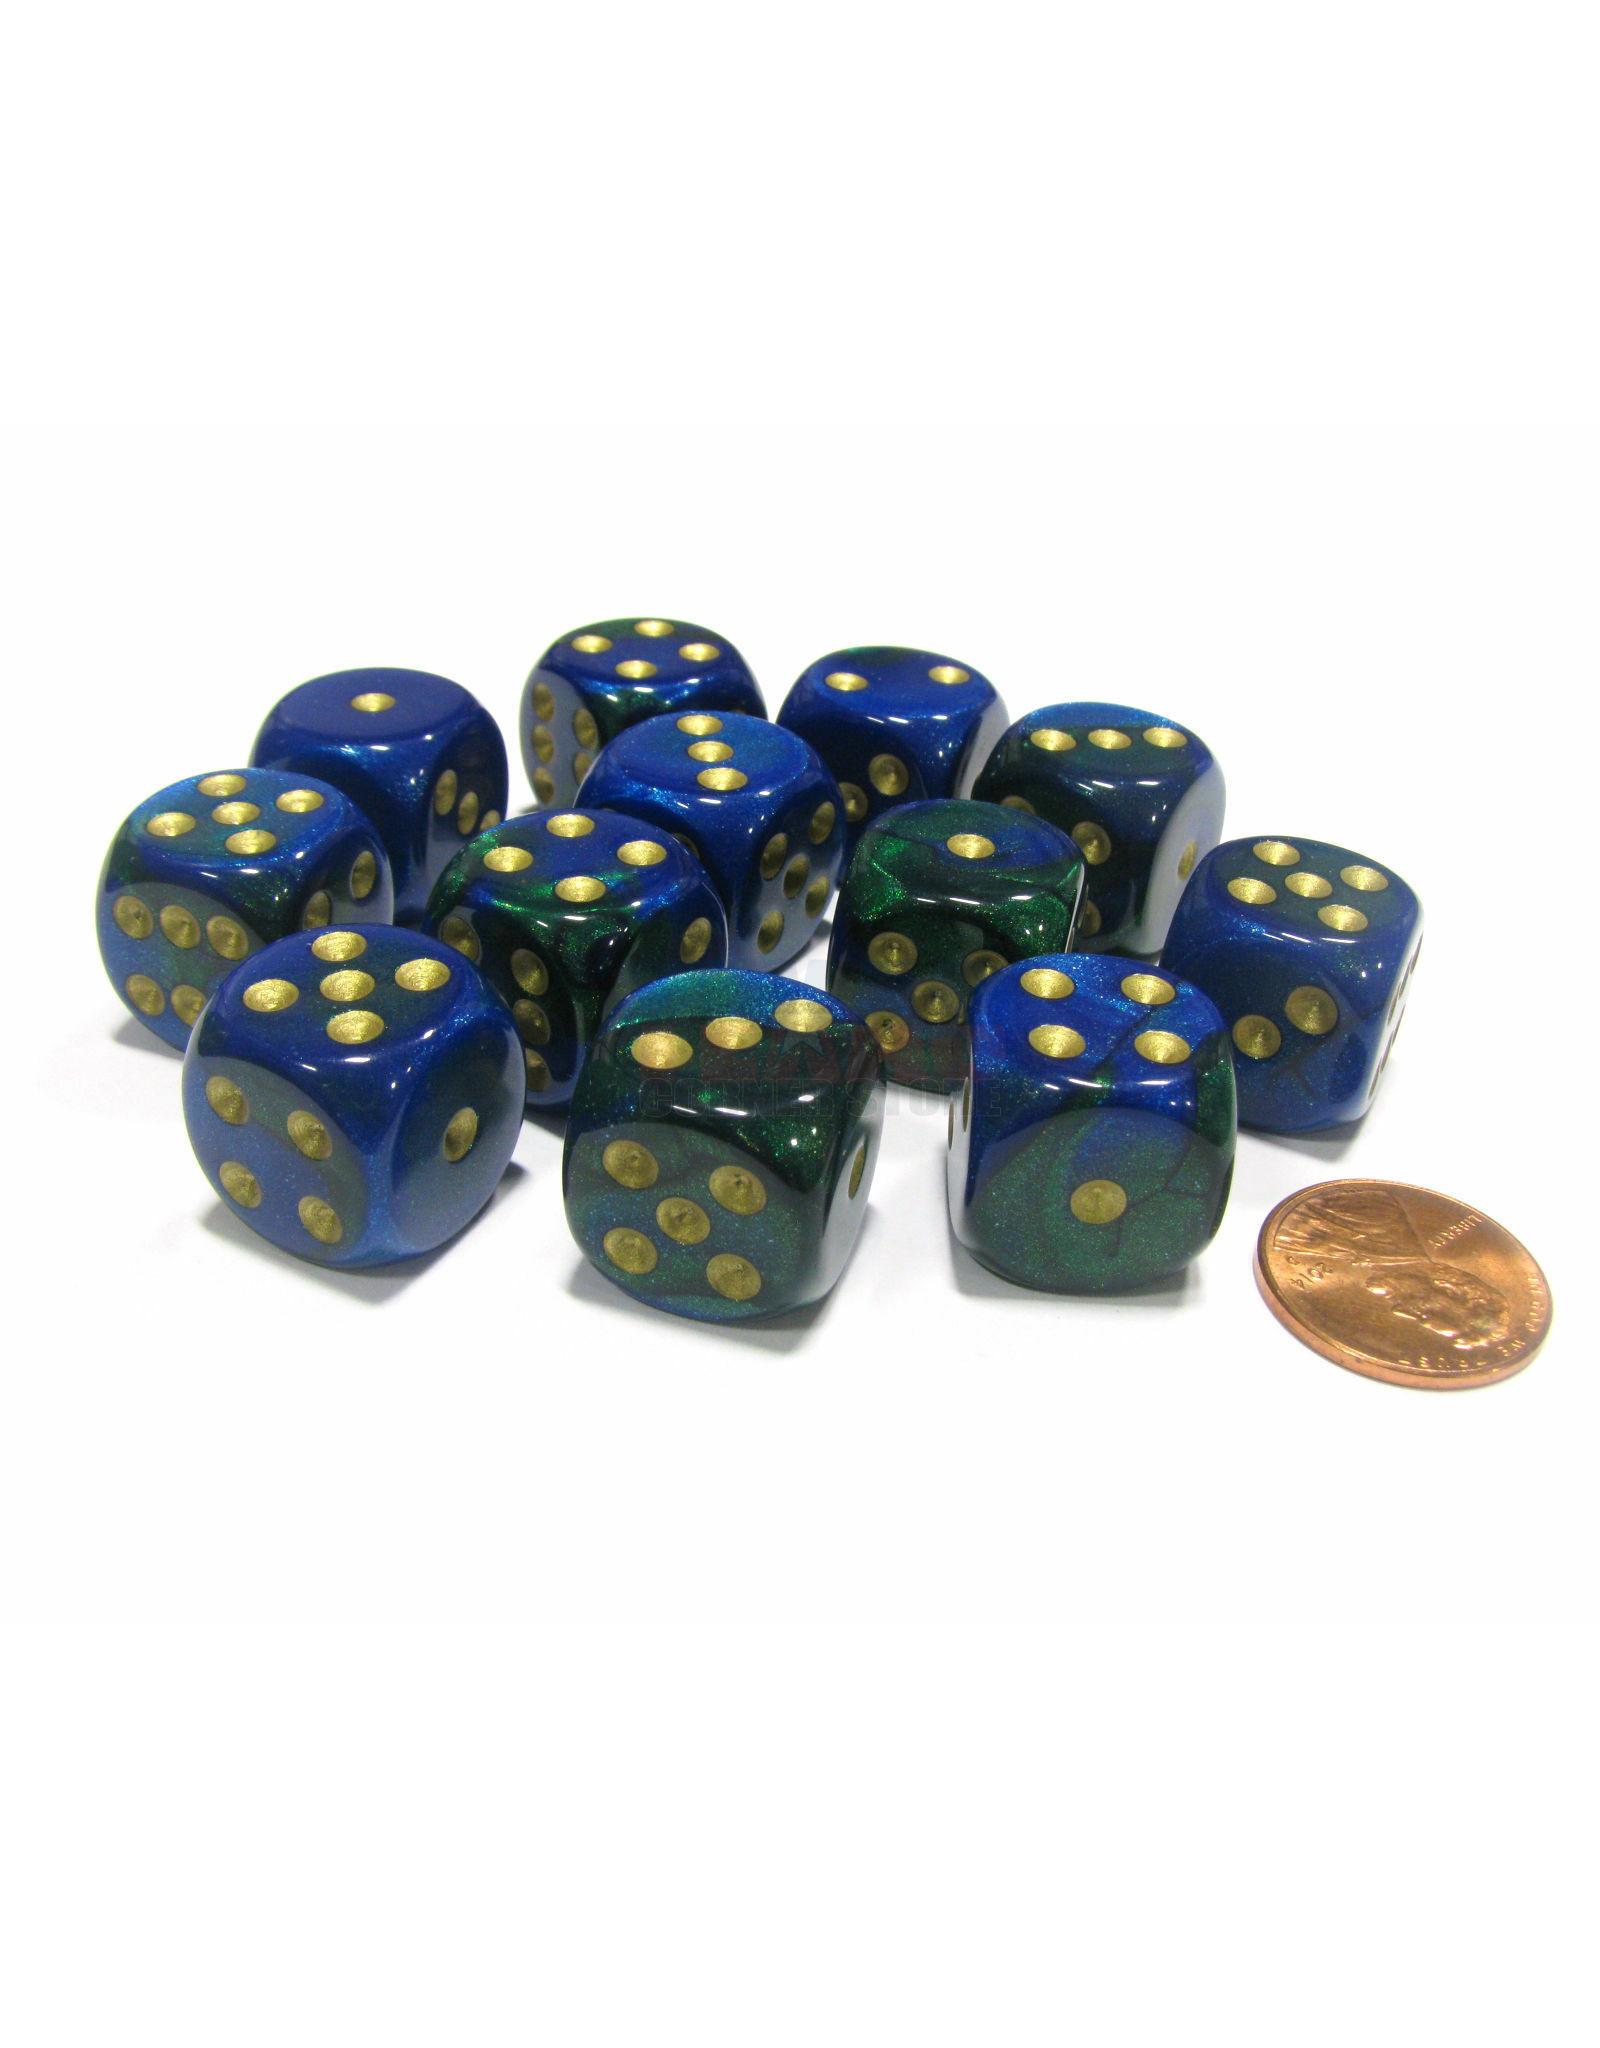 CHESSEX CHX 26636 16MM D6 DICE BLOCK BLUE GREEN W/GOLD GEMINI